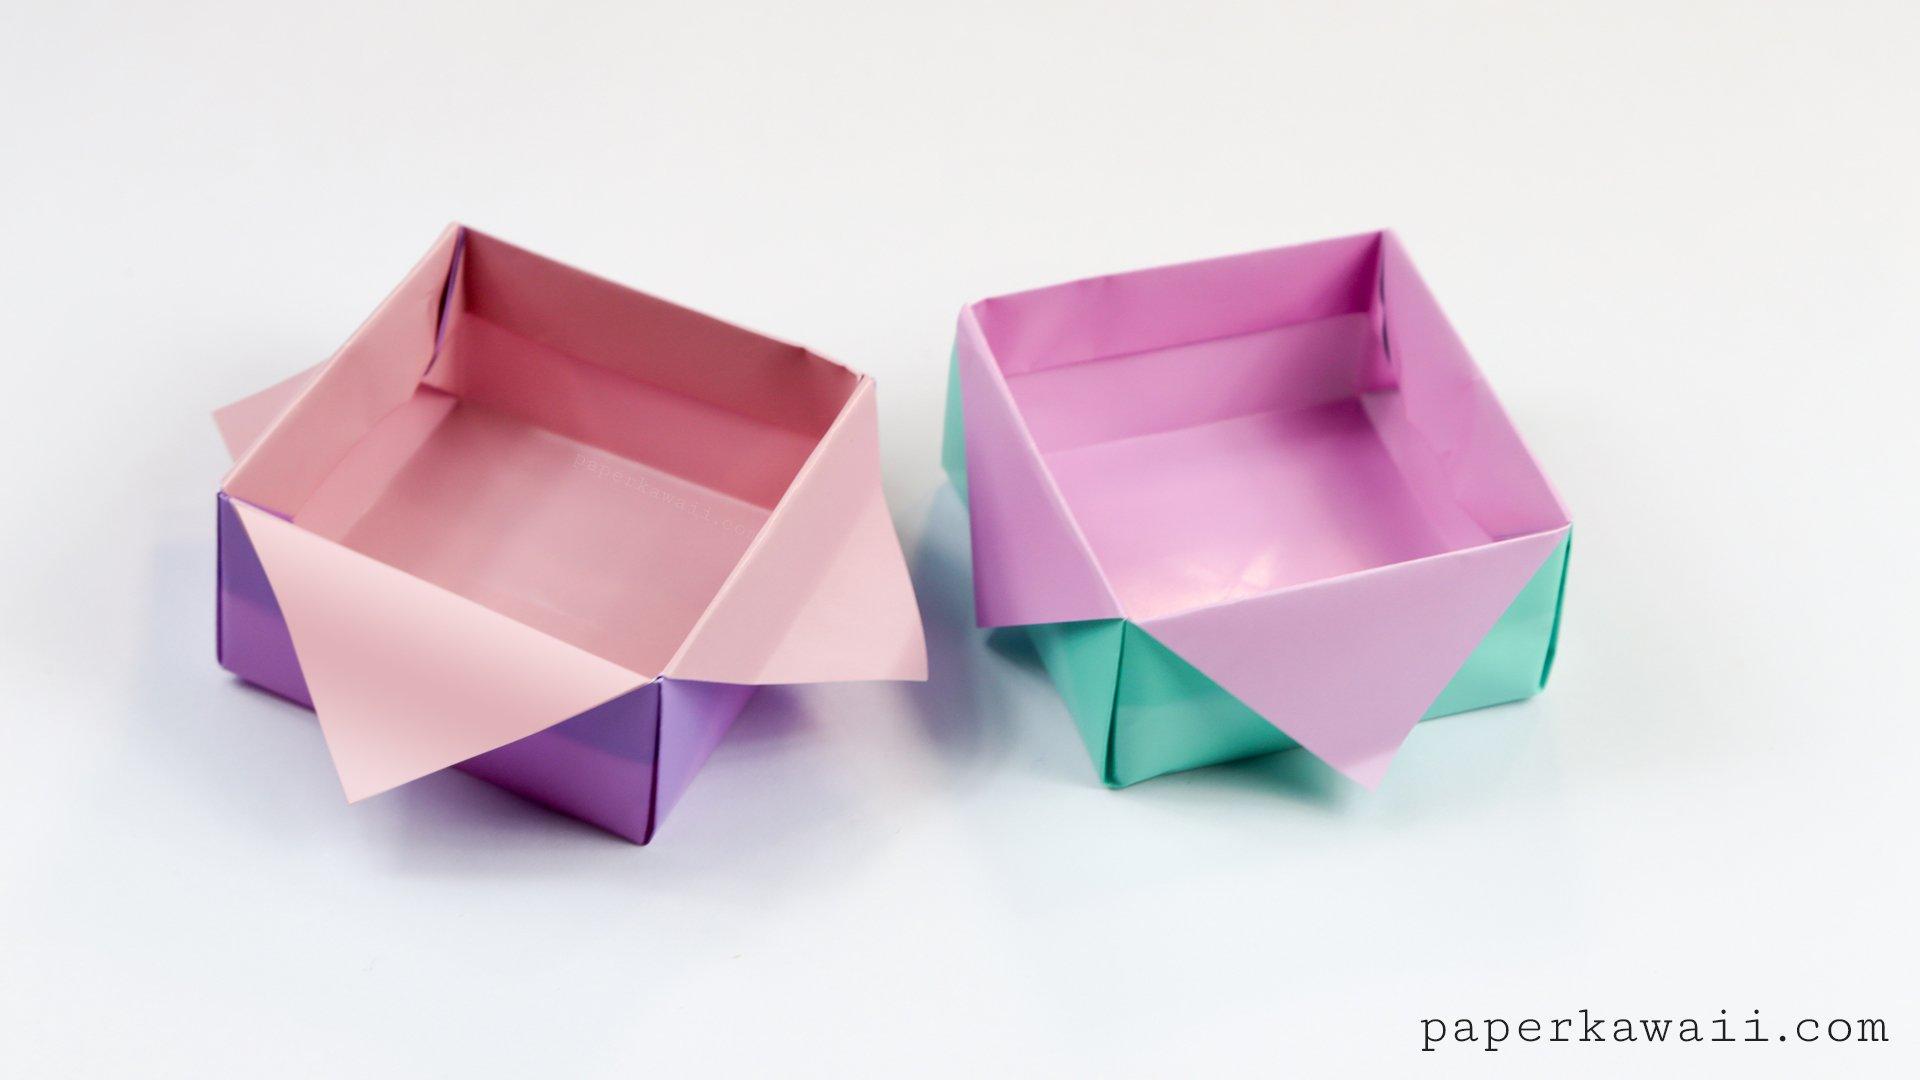 Printable Origami Diagrams